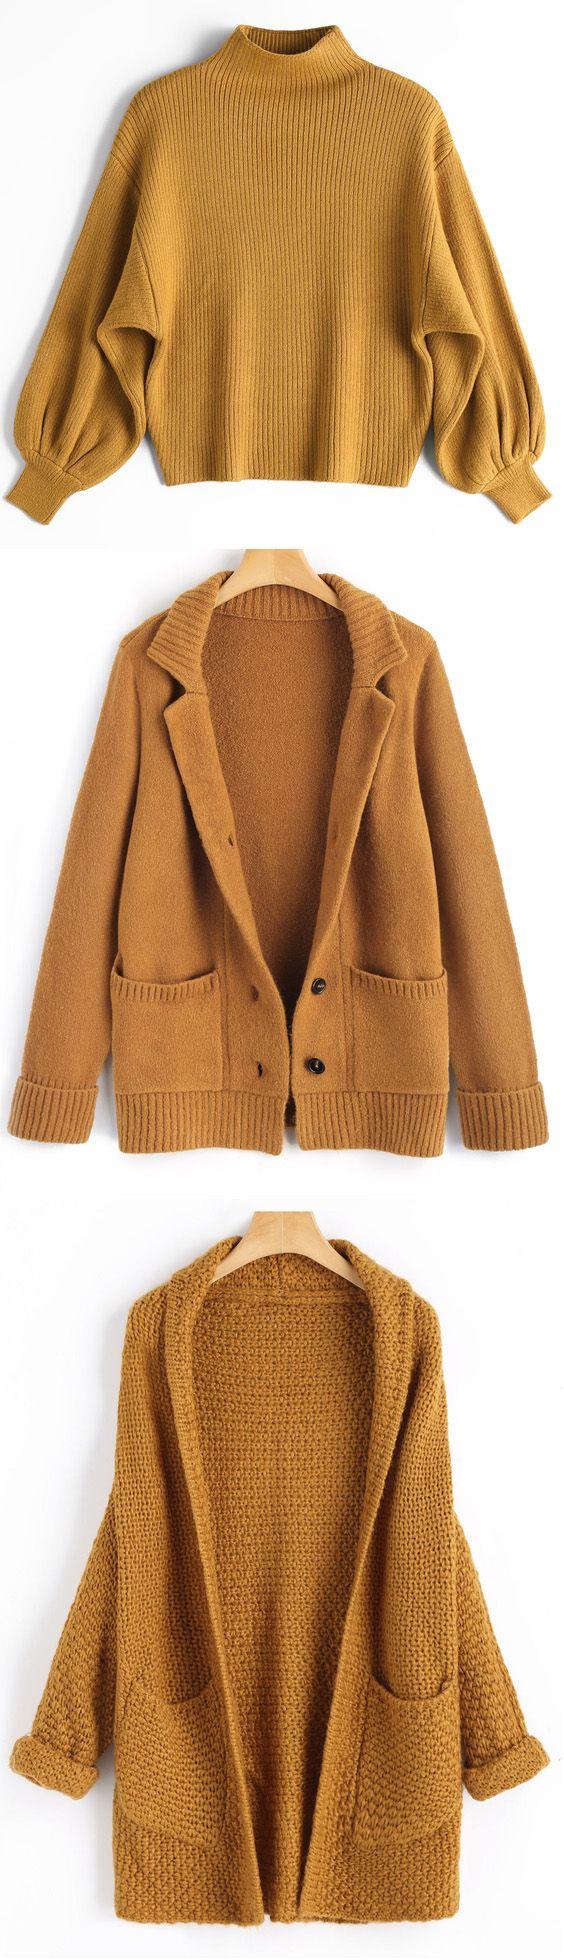 Up to 68% OFF! Lantern Sleeve Mock Neck Sweater. #Zaful #sweater Zaful, zaful outfits, fashion, style, tops, outfits, blouses, sweatshirts, hoodies, cardigan, turtleneck,cashmere,cashmere sweater sweater, cute sweater, floral sweater, cropped hoodies, pearl sweater, knitwear, fall, winter, winter outfits, winter fashion, fall fashion, fall outfits, Christmas, ugly, ugly Christmas, Thanksgiving, gift, Christmas hoodies, Black Friday, Cyber Monday @zaful Extra 10% OFF Code:ZF2017